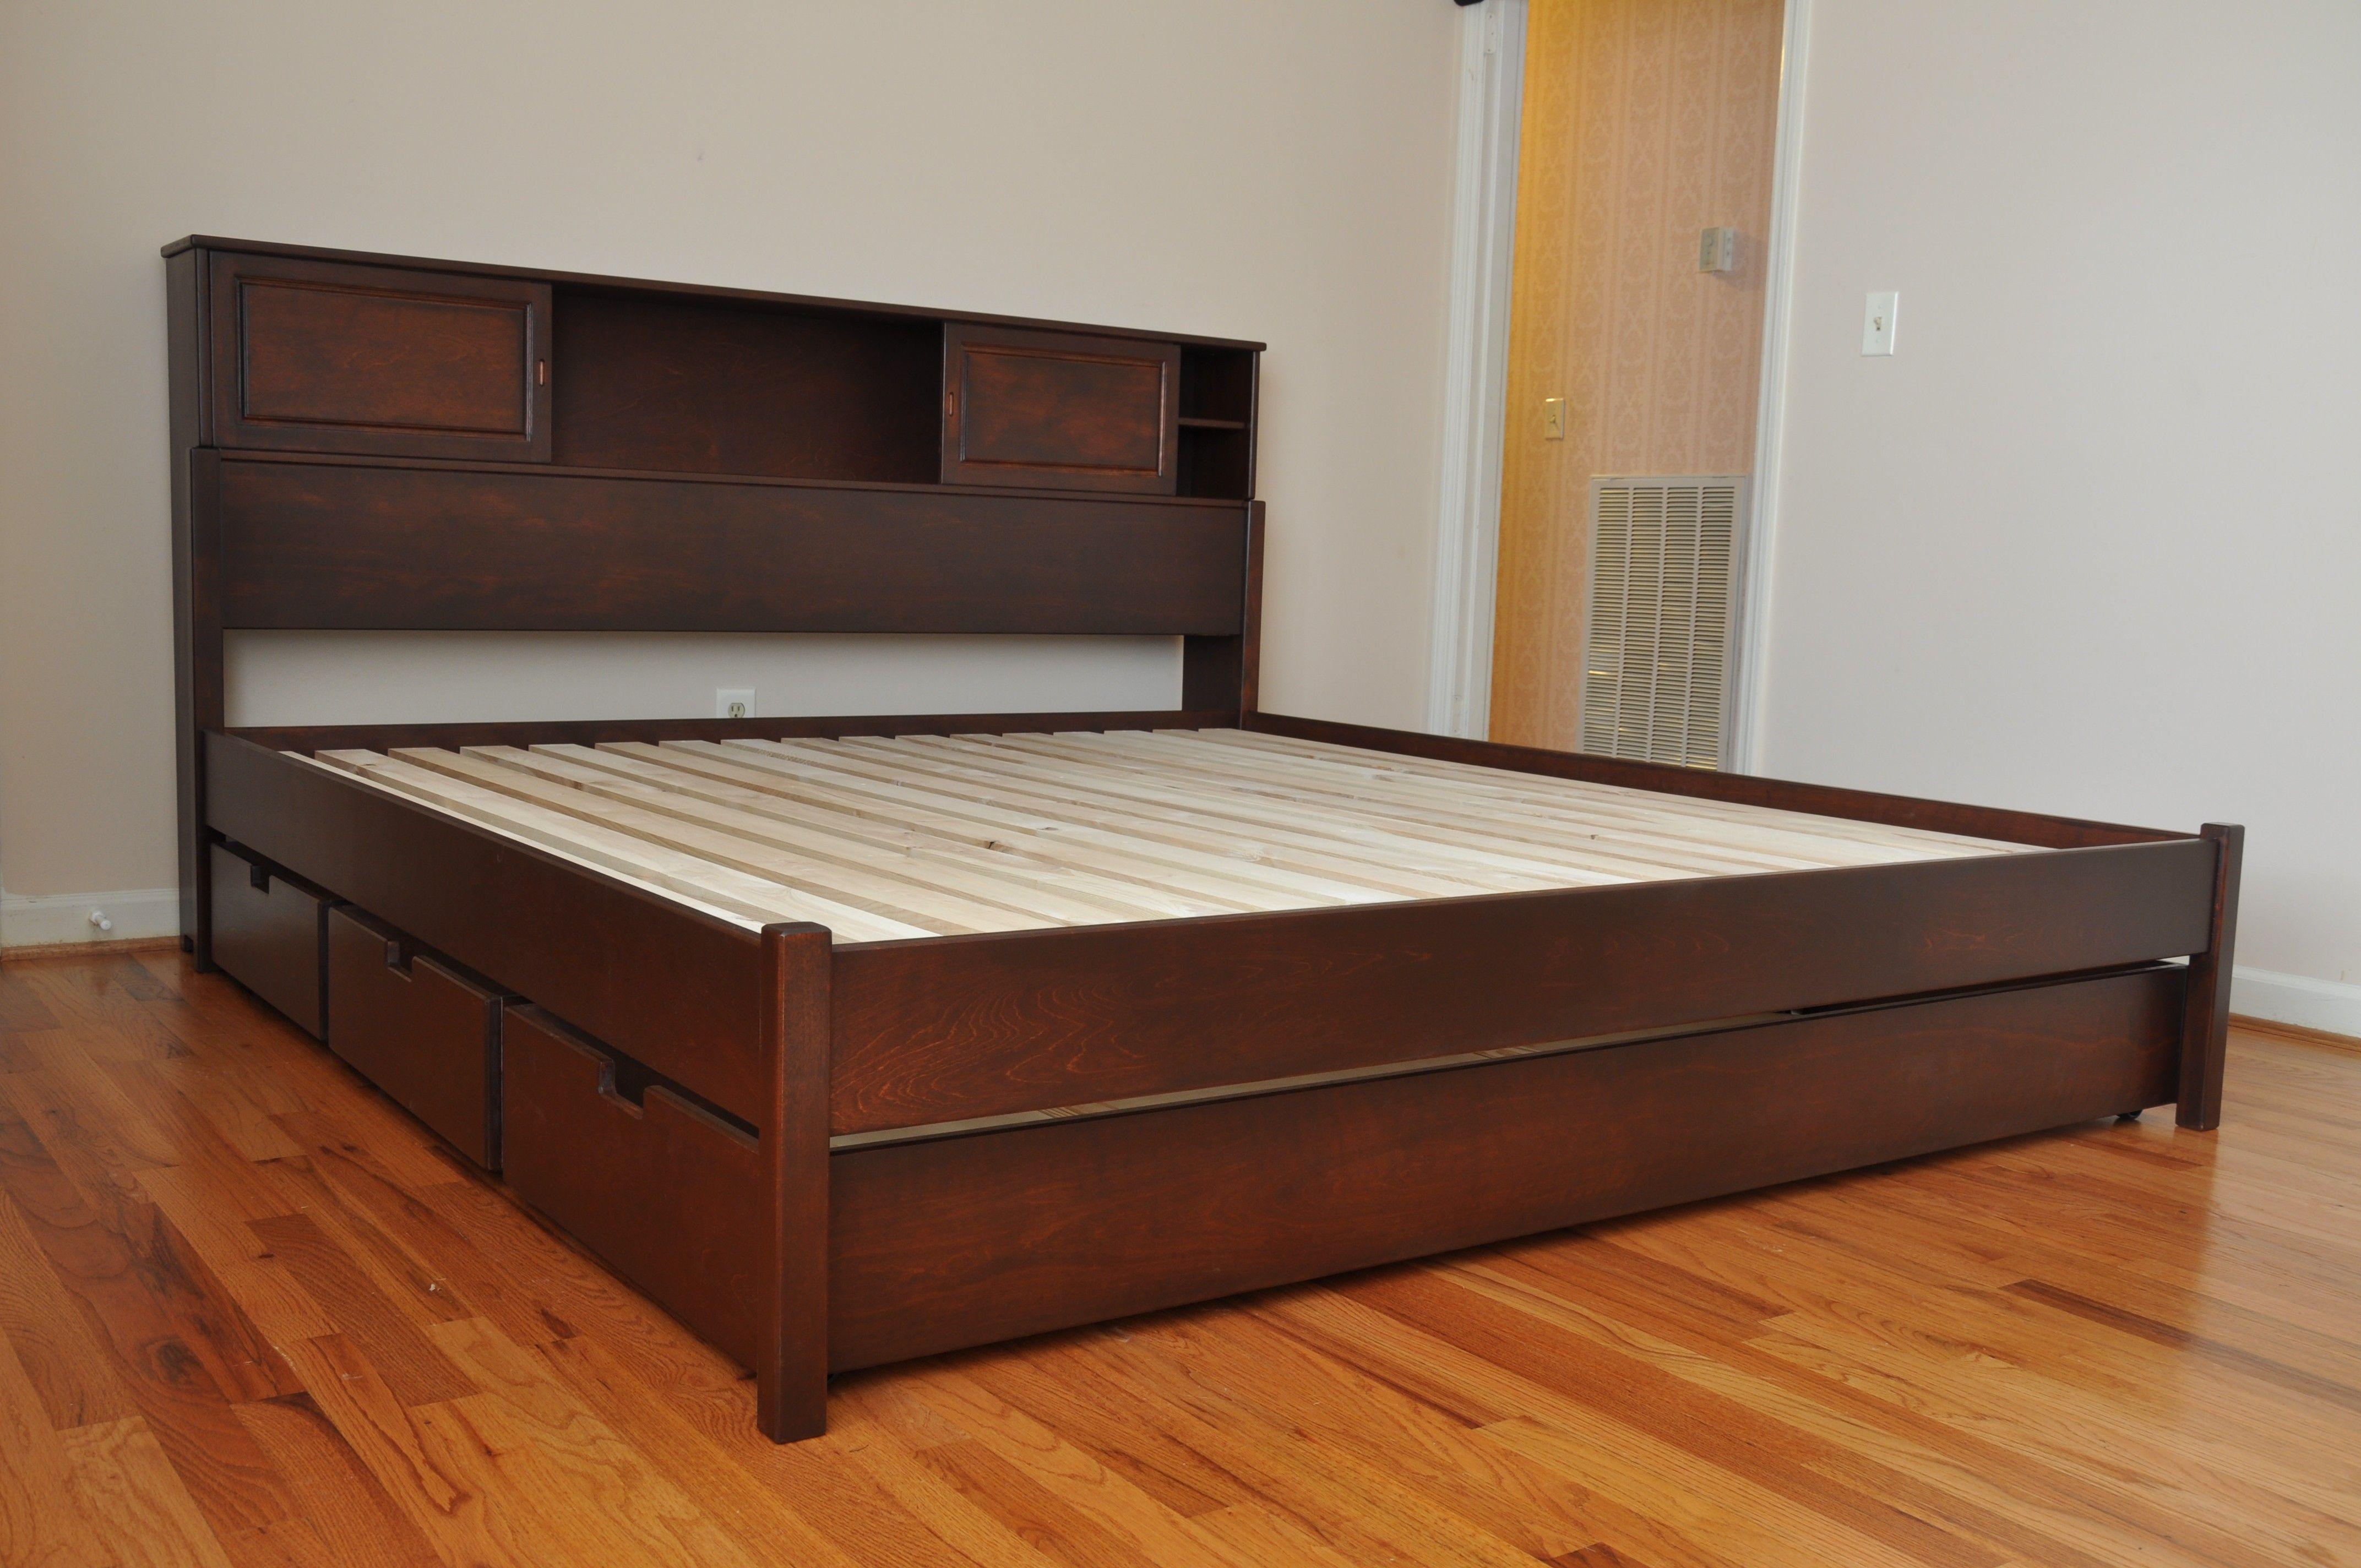 Print of Low Profile Bed Frame Queen Bedroom Design